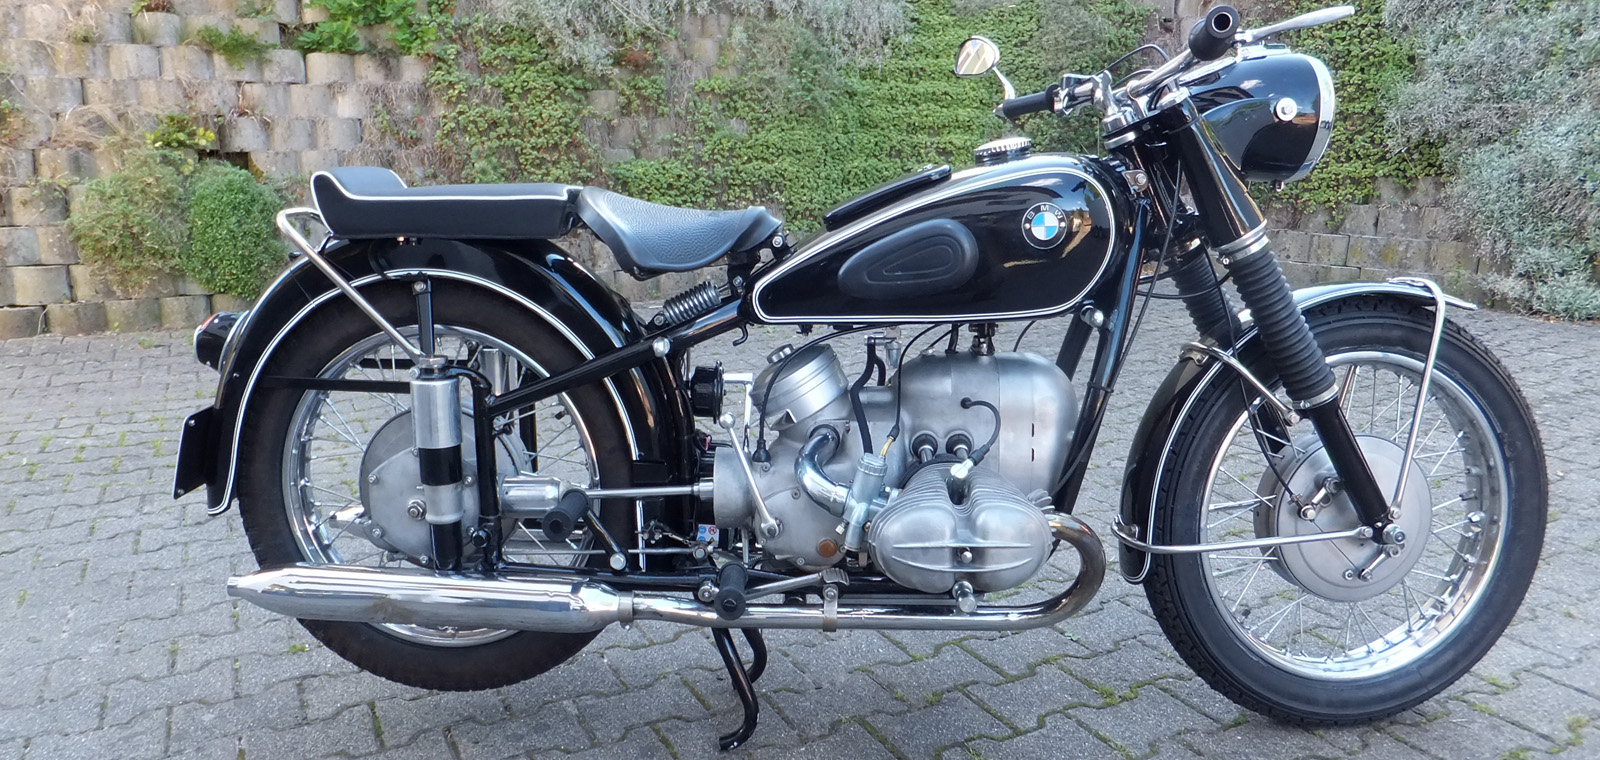 Sitzkissen Motorrad